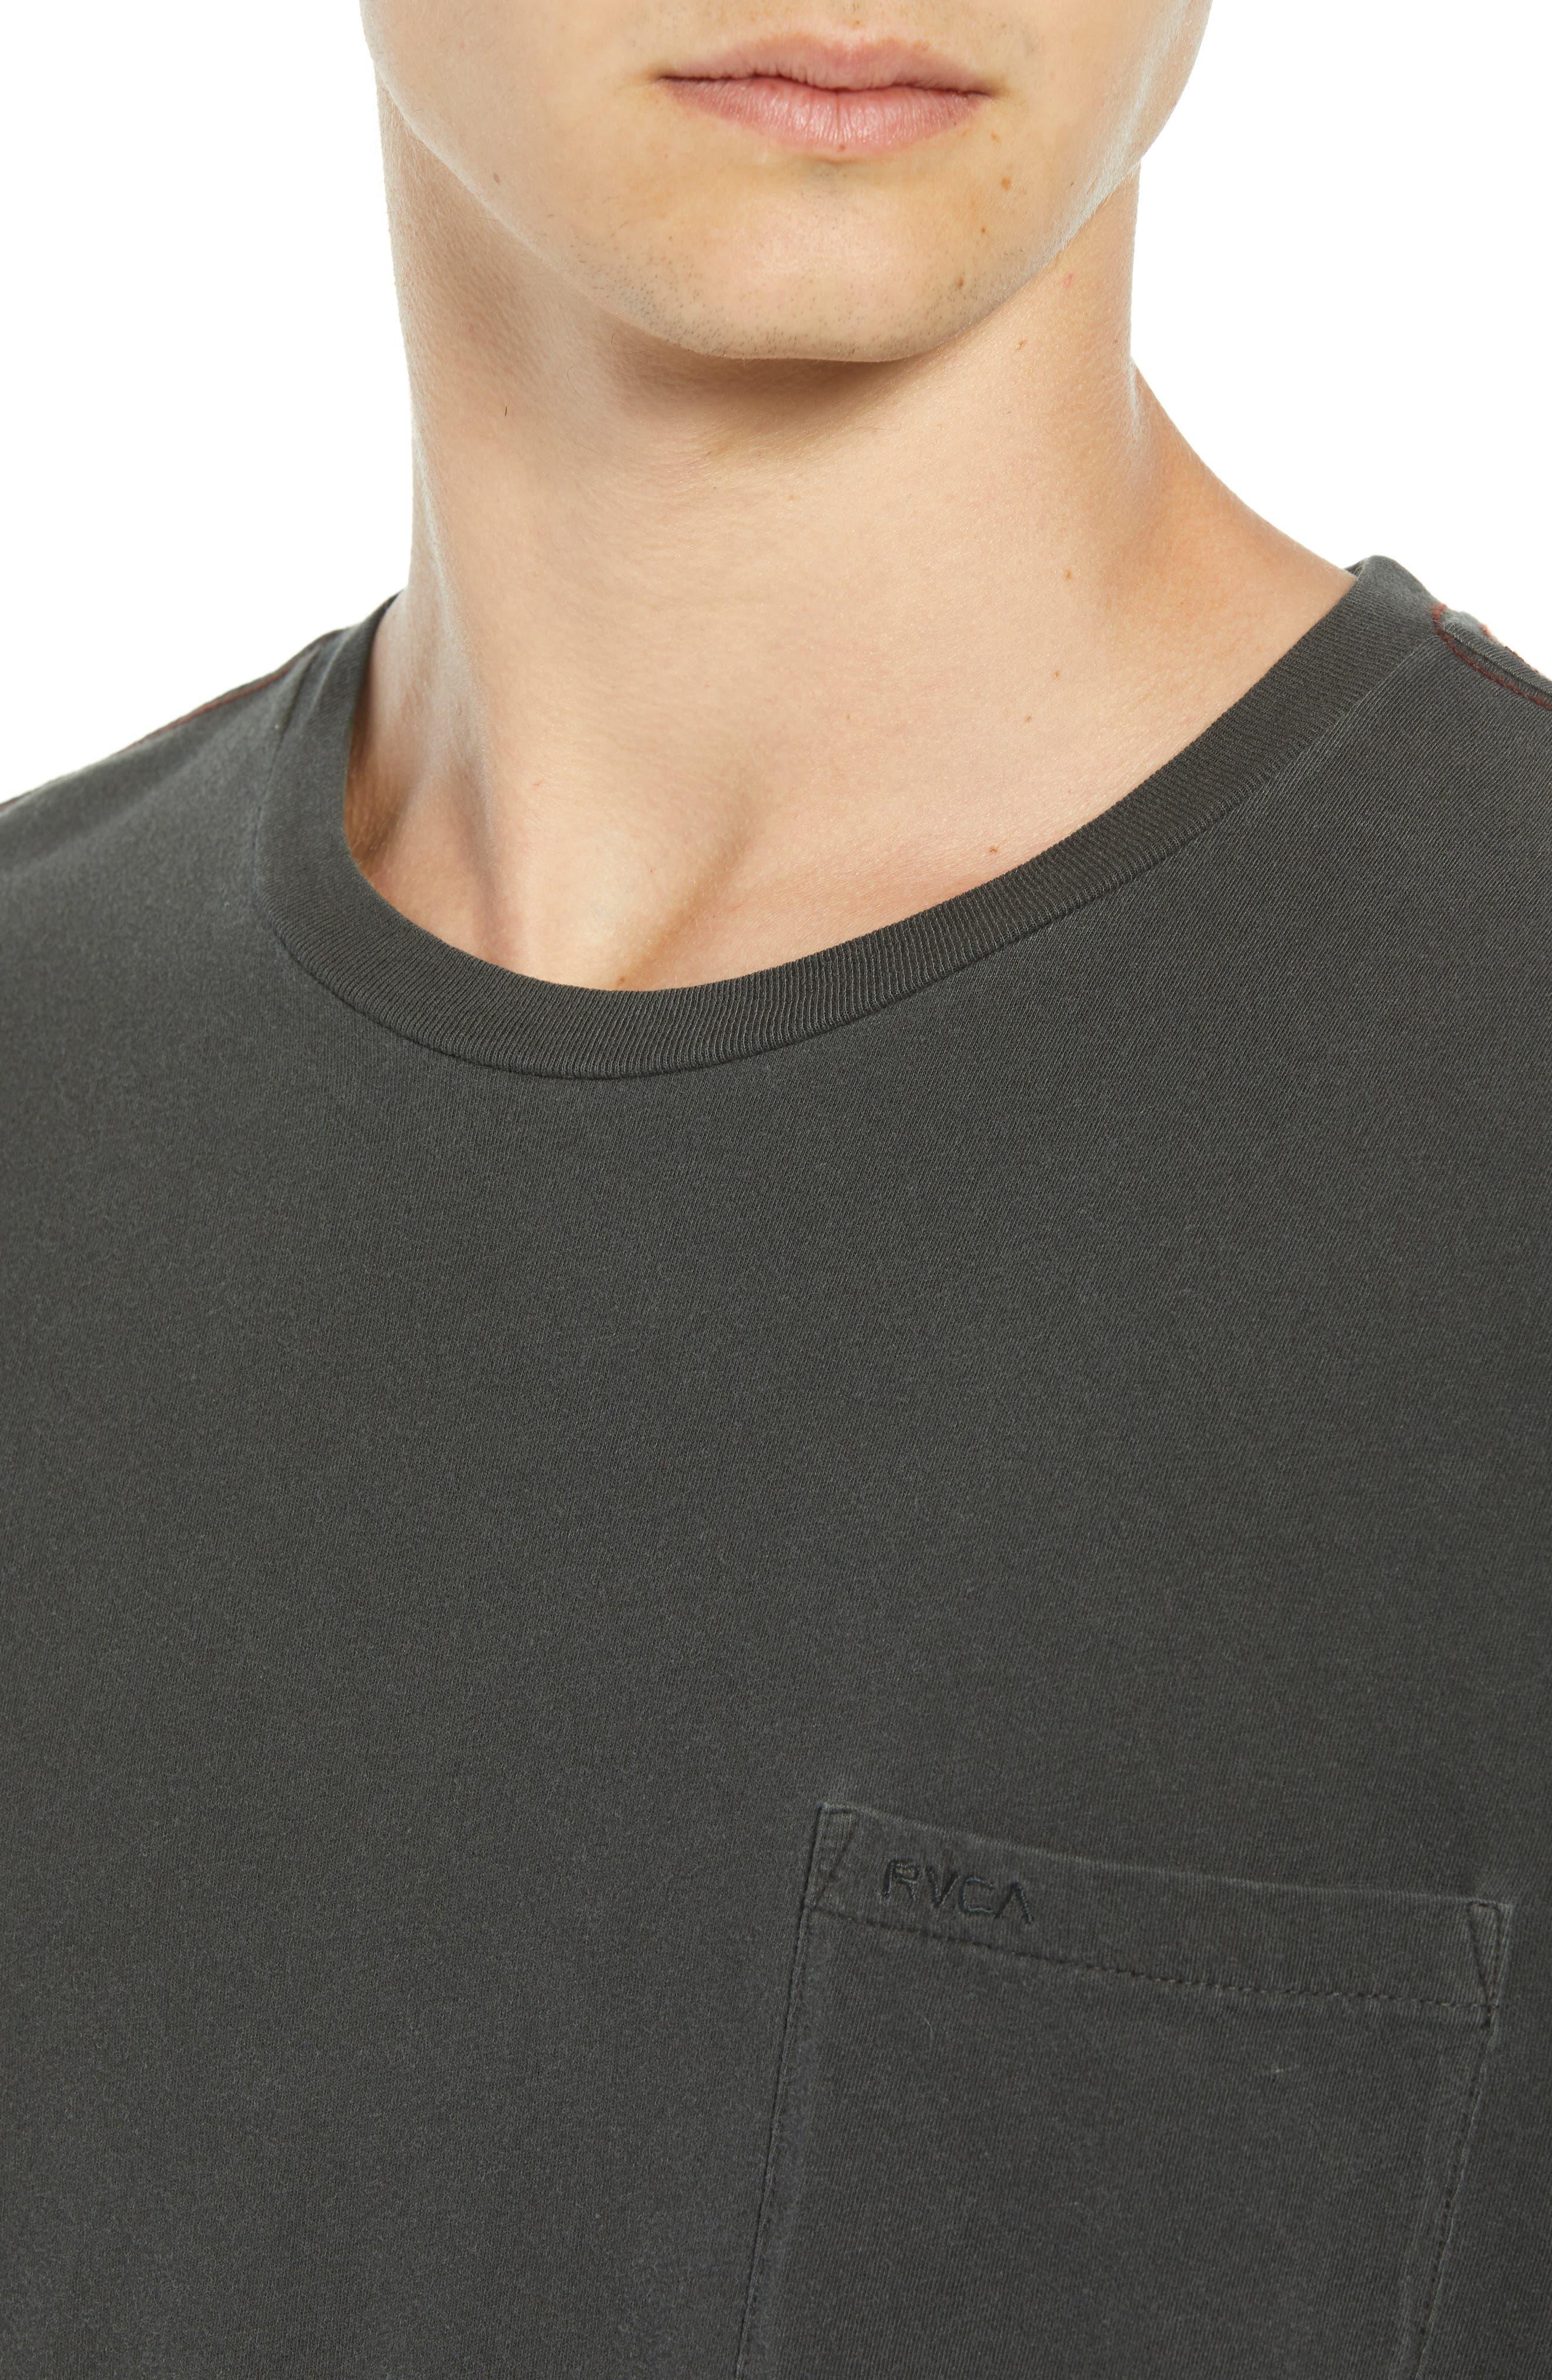 PTC Pigment Long Sleeve T-Shirt,                             Alternate thumbnail 4, color,                             PIRATE BLACK